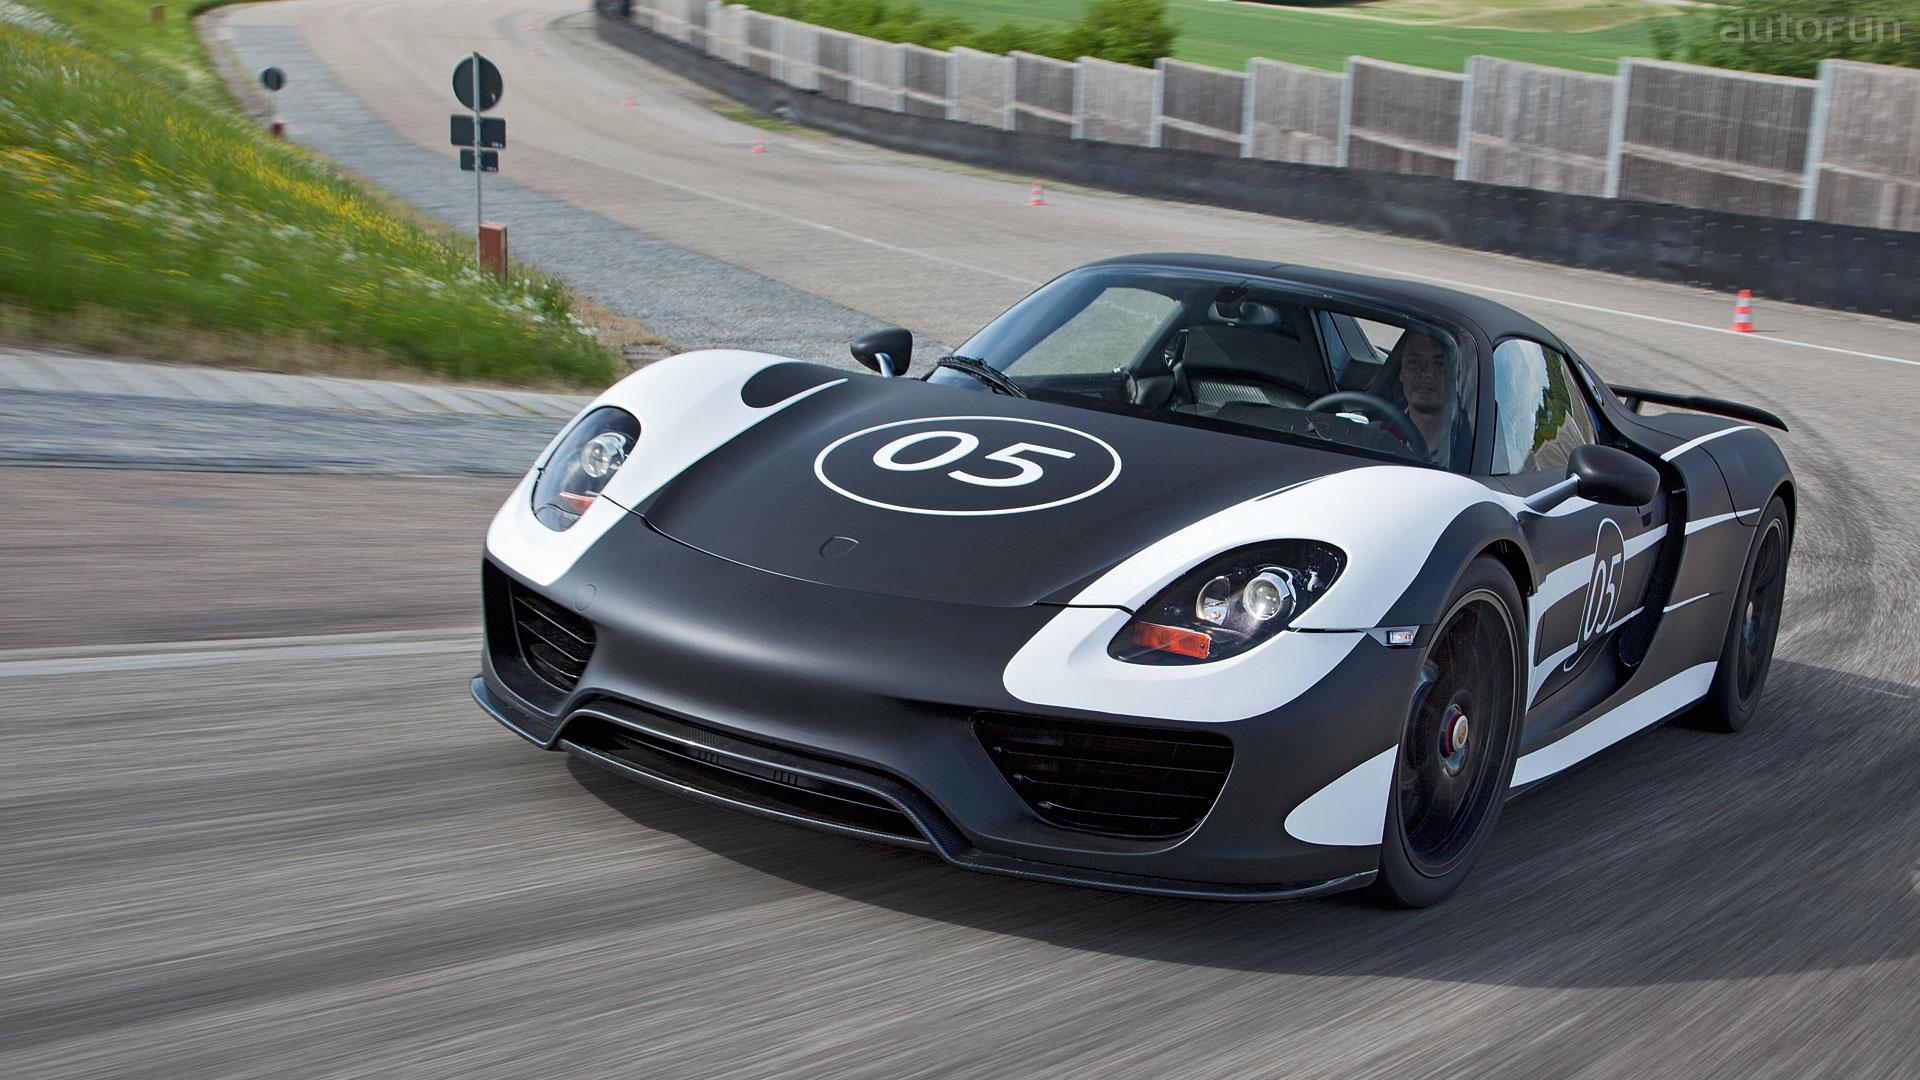 Tapeta Na Plochu Porsche 918 Spyder 1920x1080 Autofun Cz